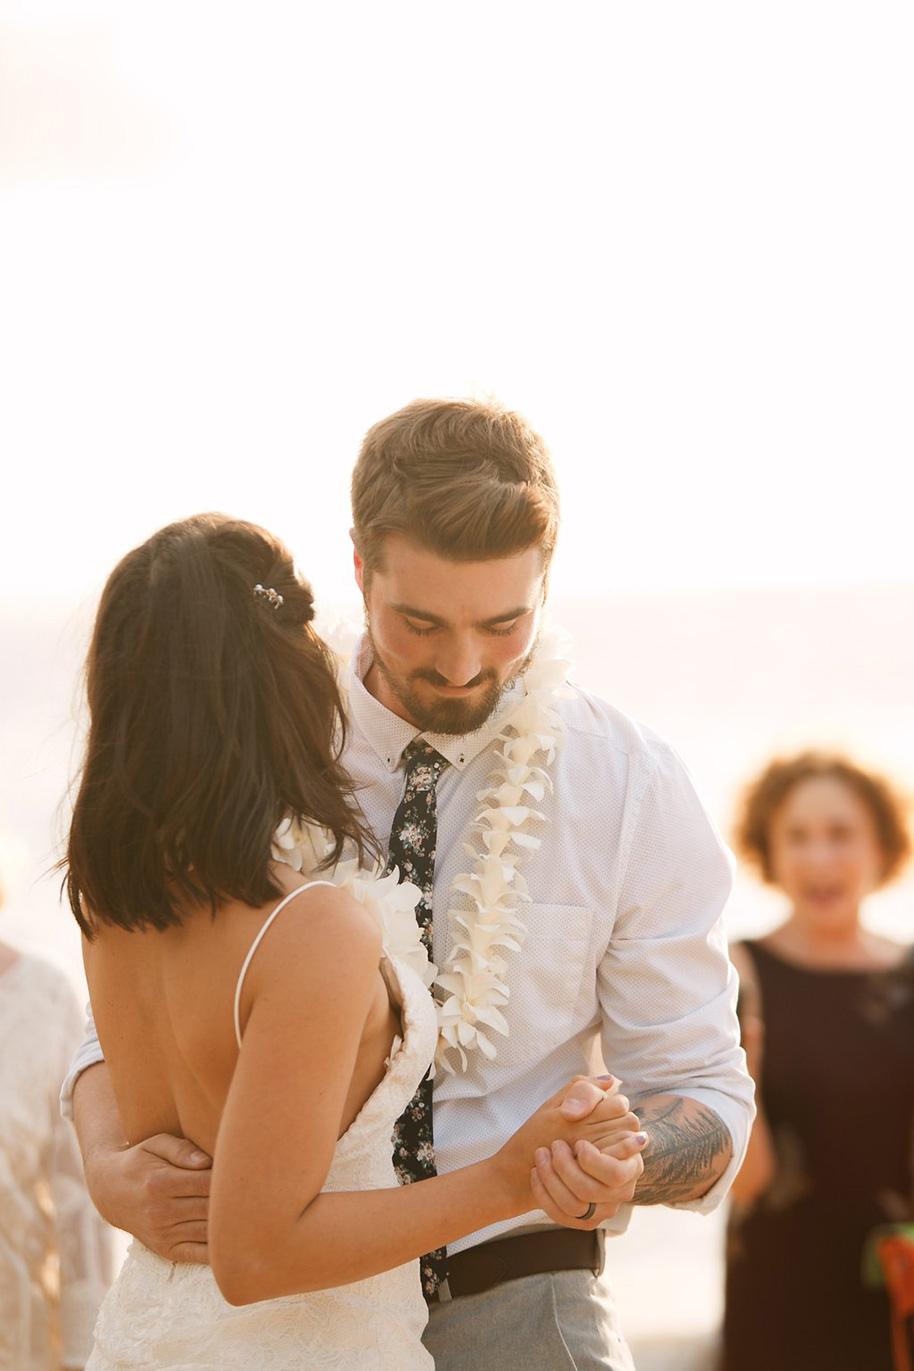 Maui-Beach-Wedding-070616-15.jpg